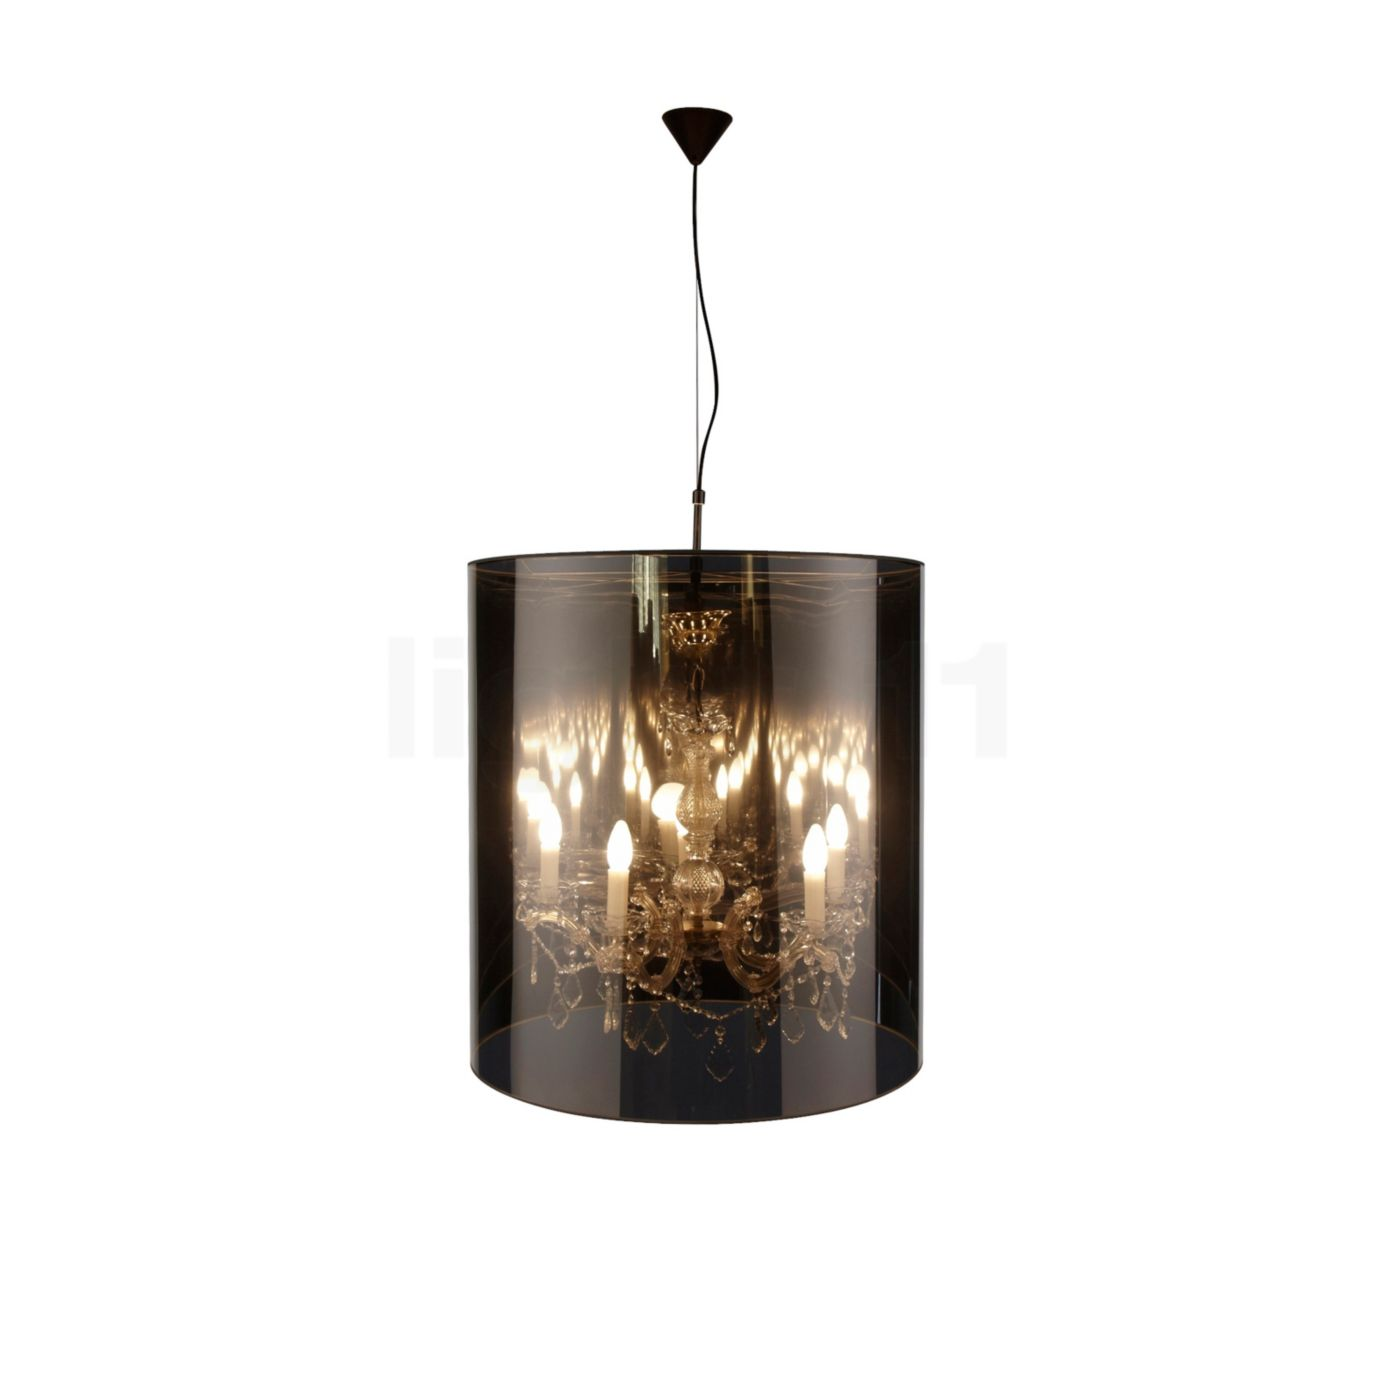 sc 1 st  Design lights u0026 designer l&s light11.eu & Moooi Light Shade Shade Pendant lights buy at light11.eu